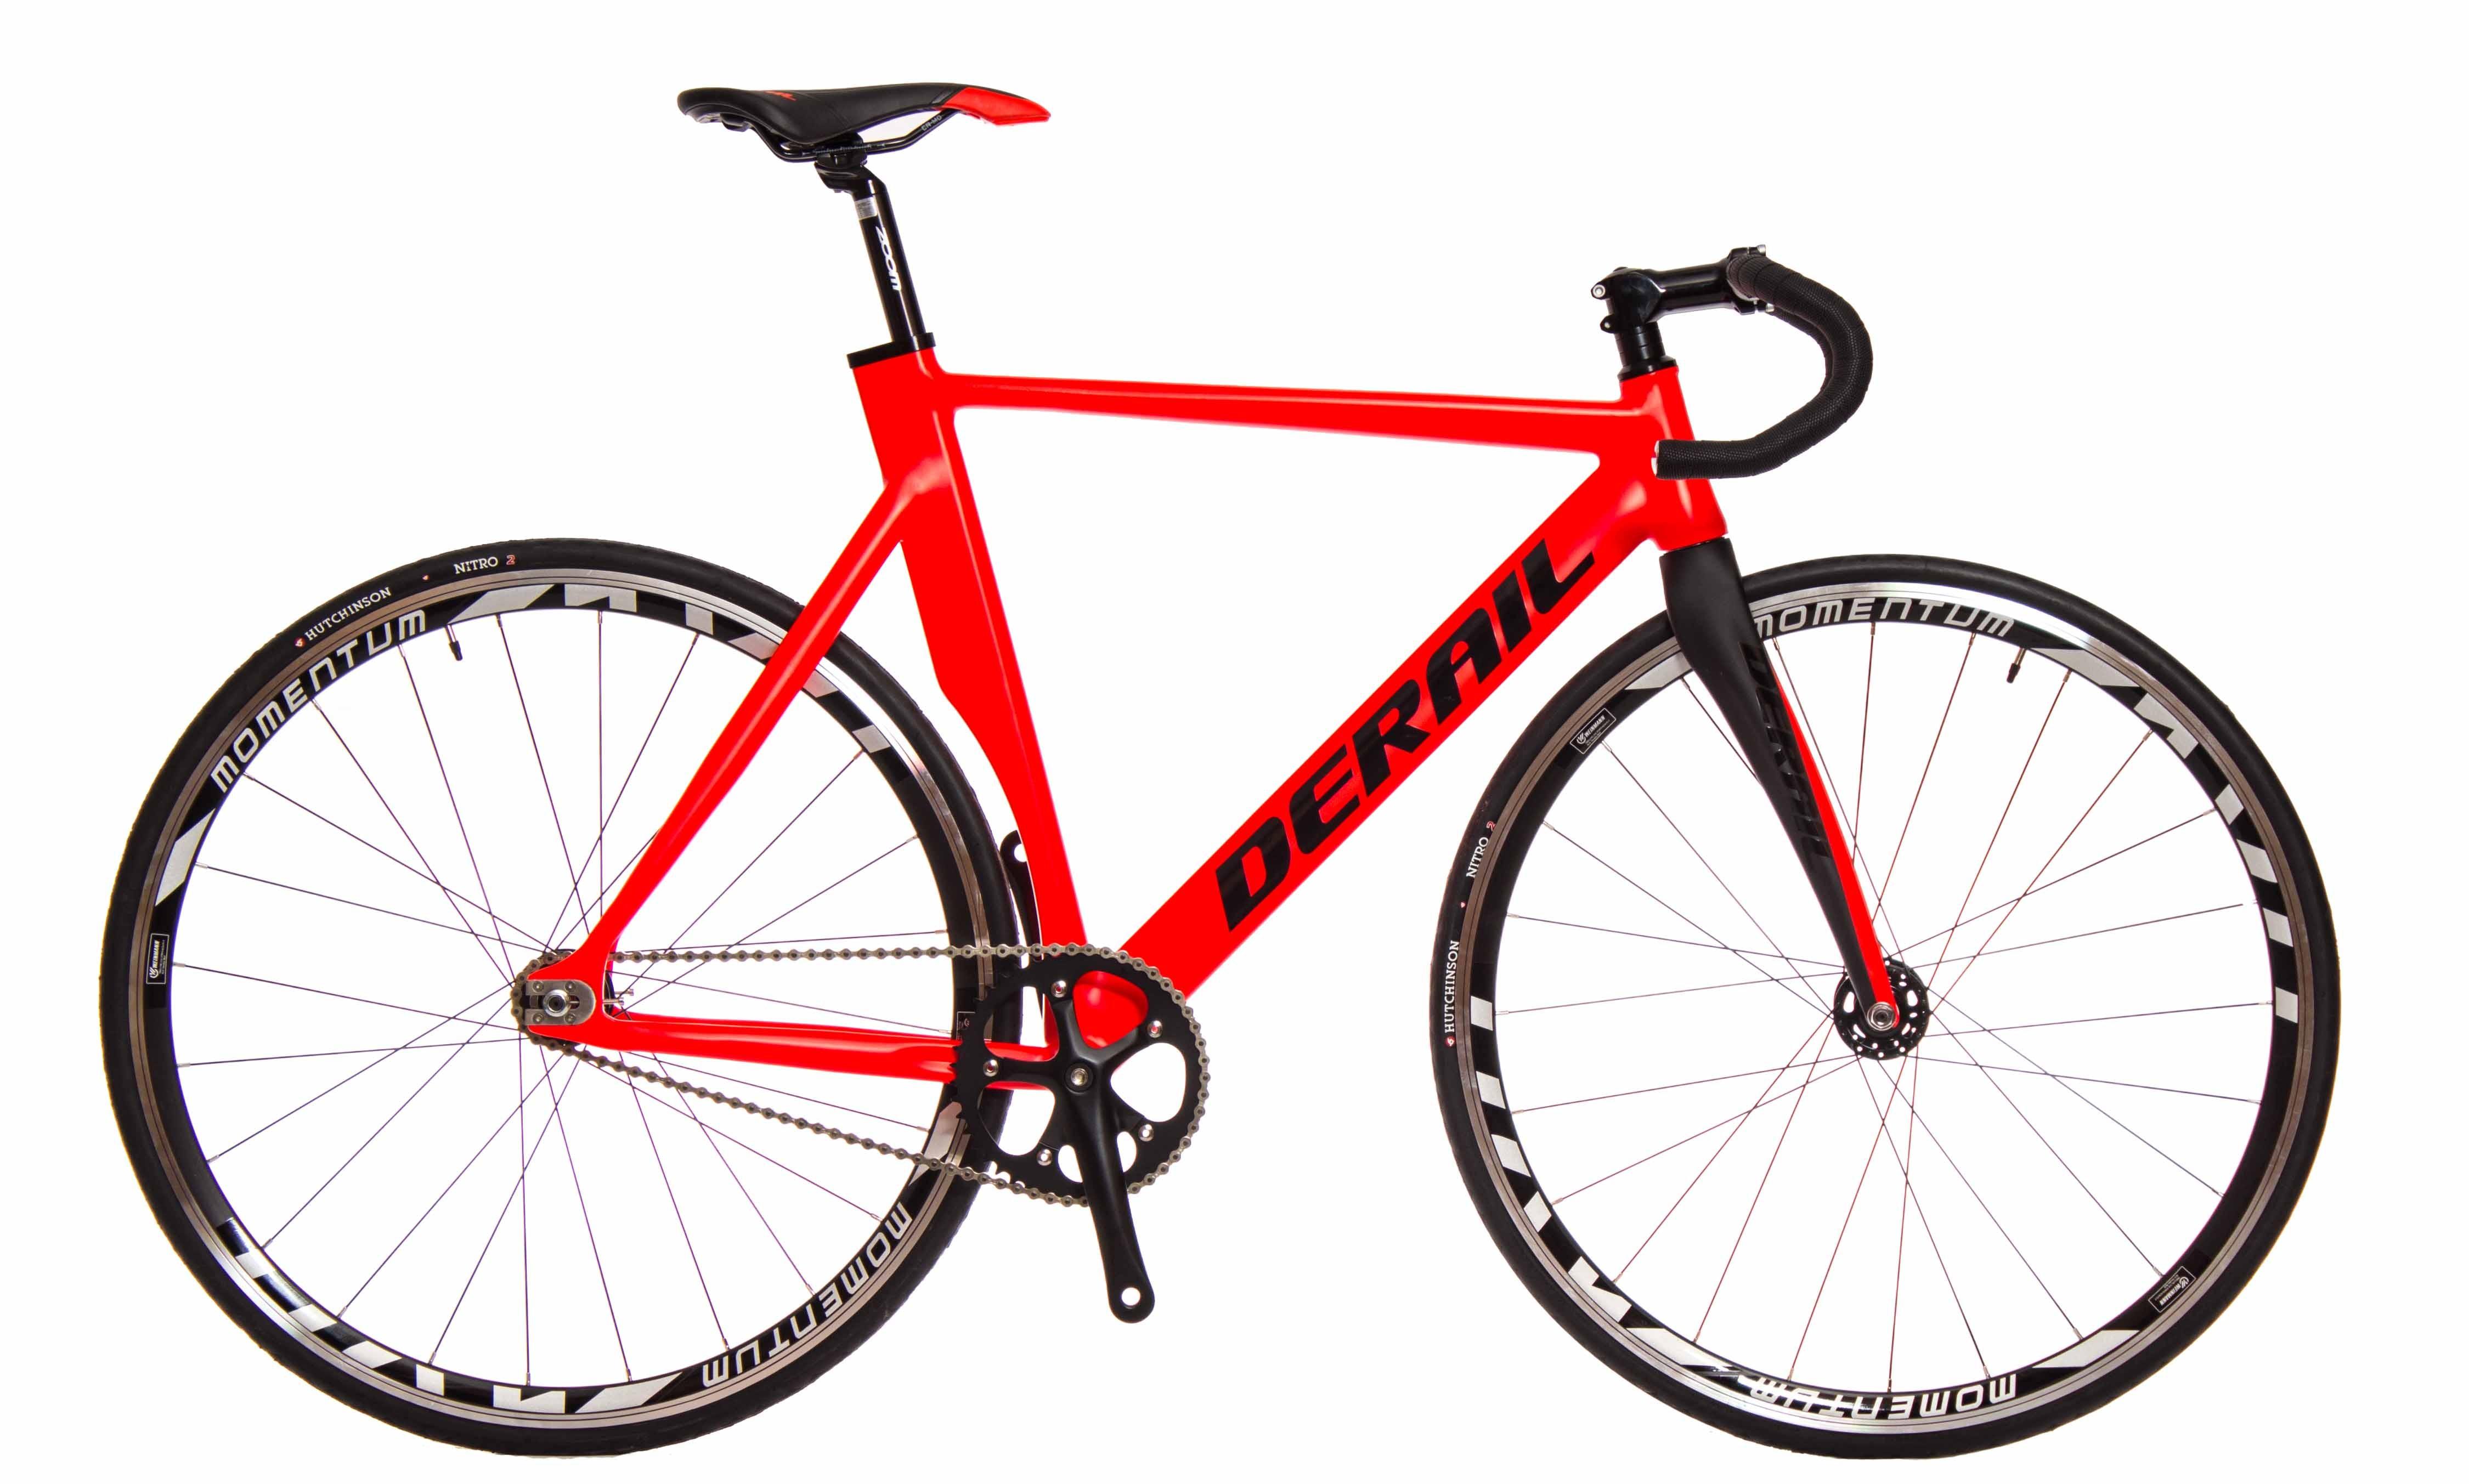 Bicicleta pista fixie derail roja